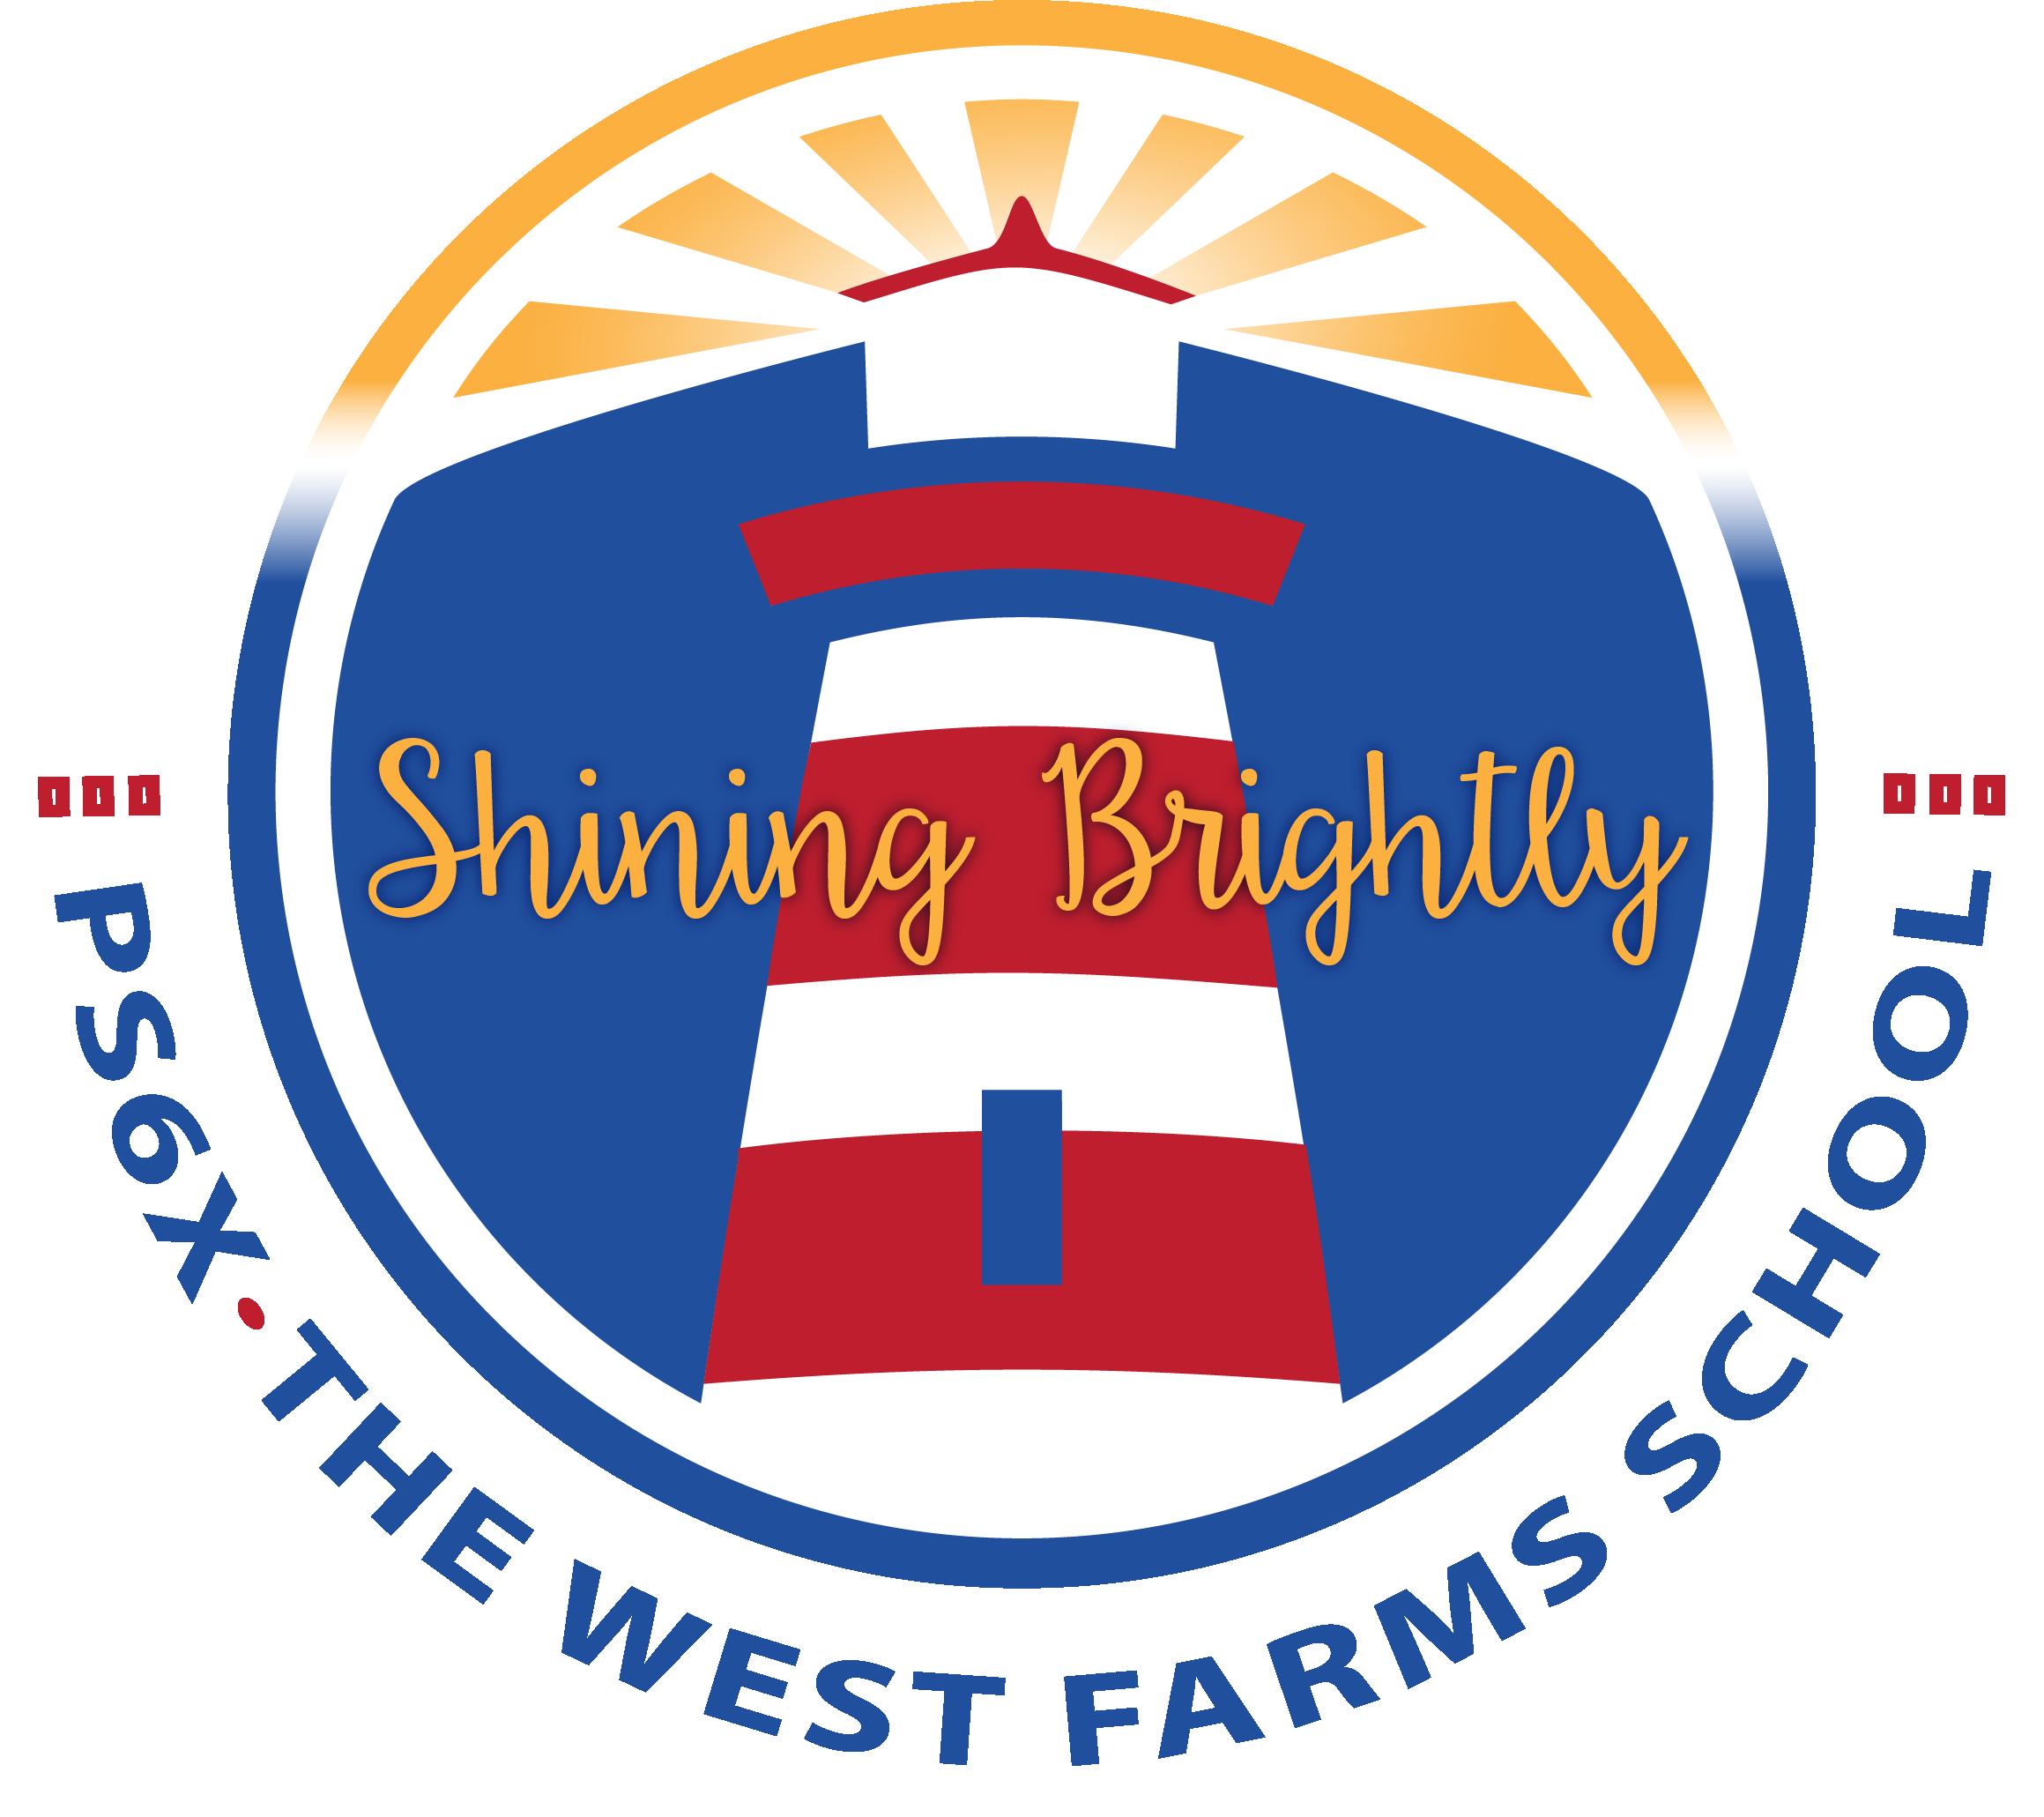 P.S. 6X The West Farms School